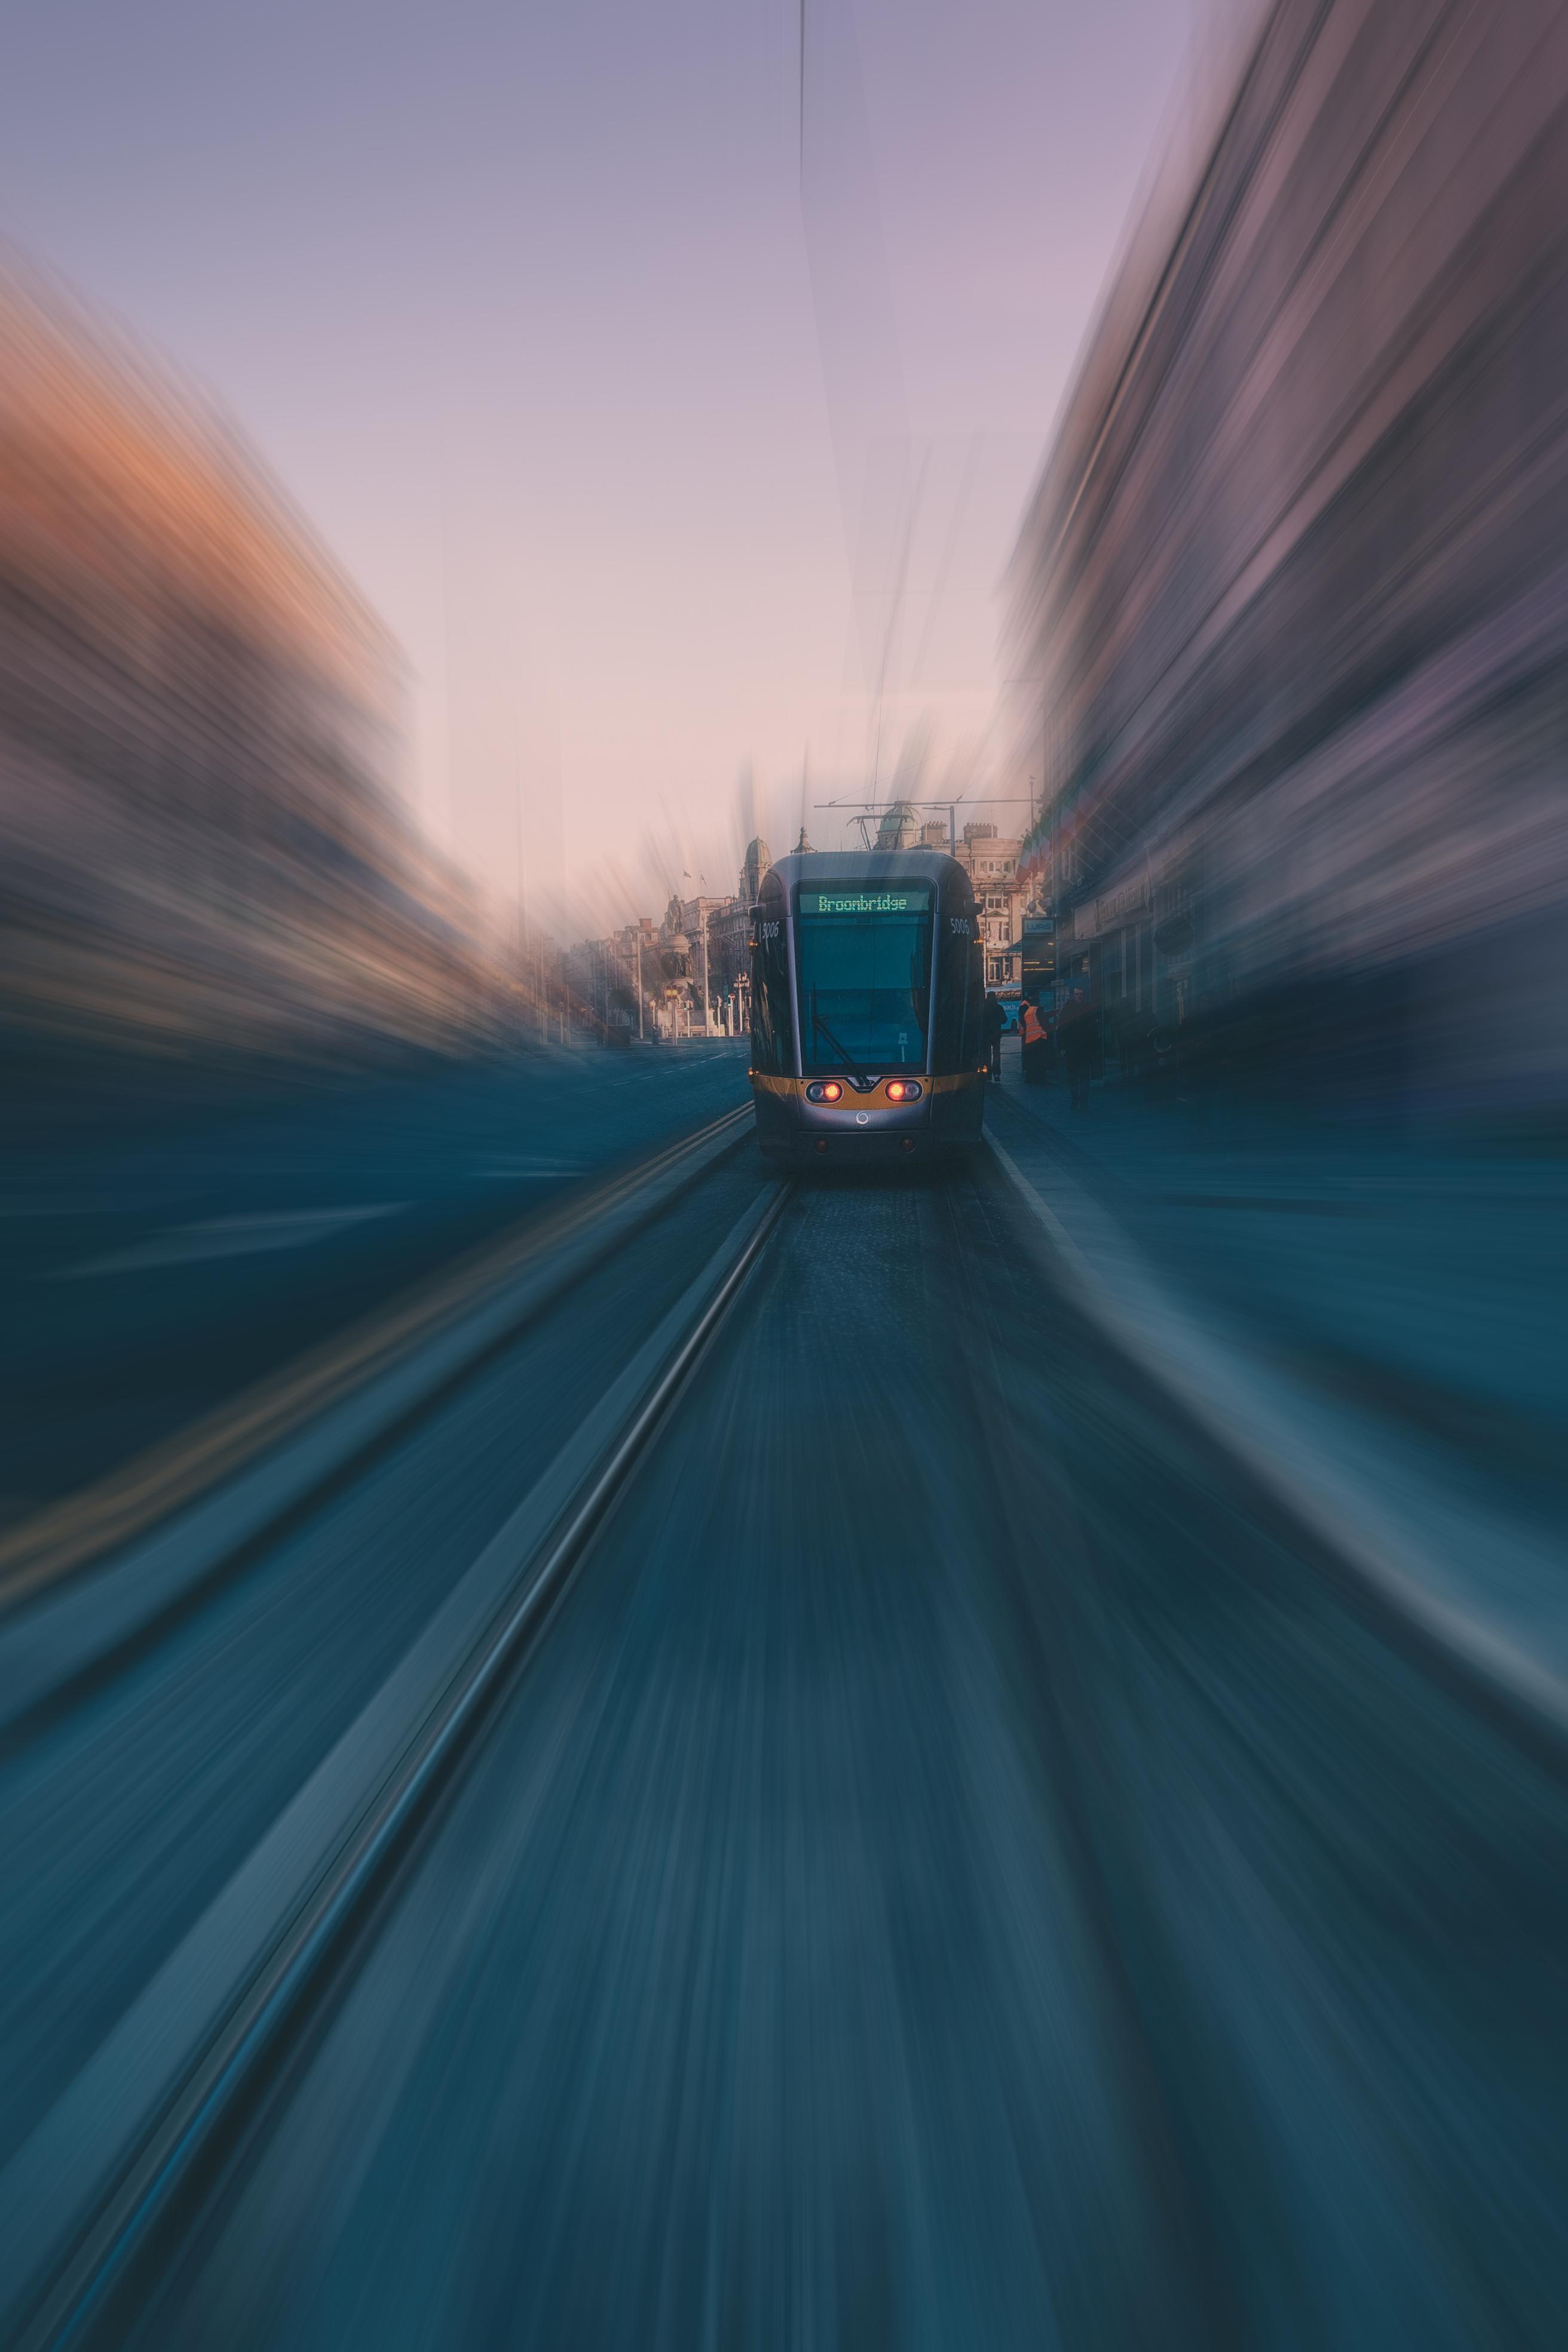 Time Lapse Photo Of Black Vehicle, Action, Movement, Travel, Transportation system, HQ Photo